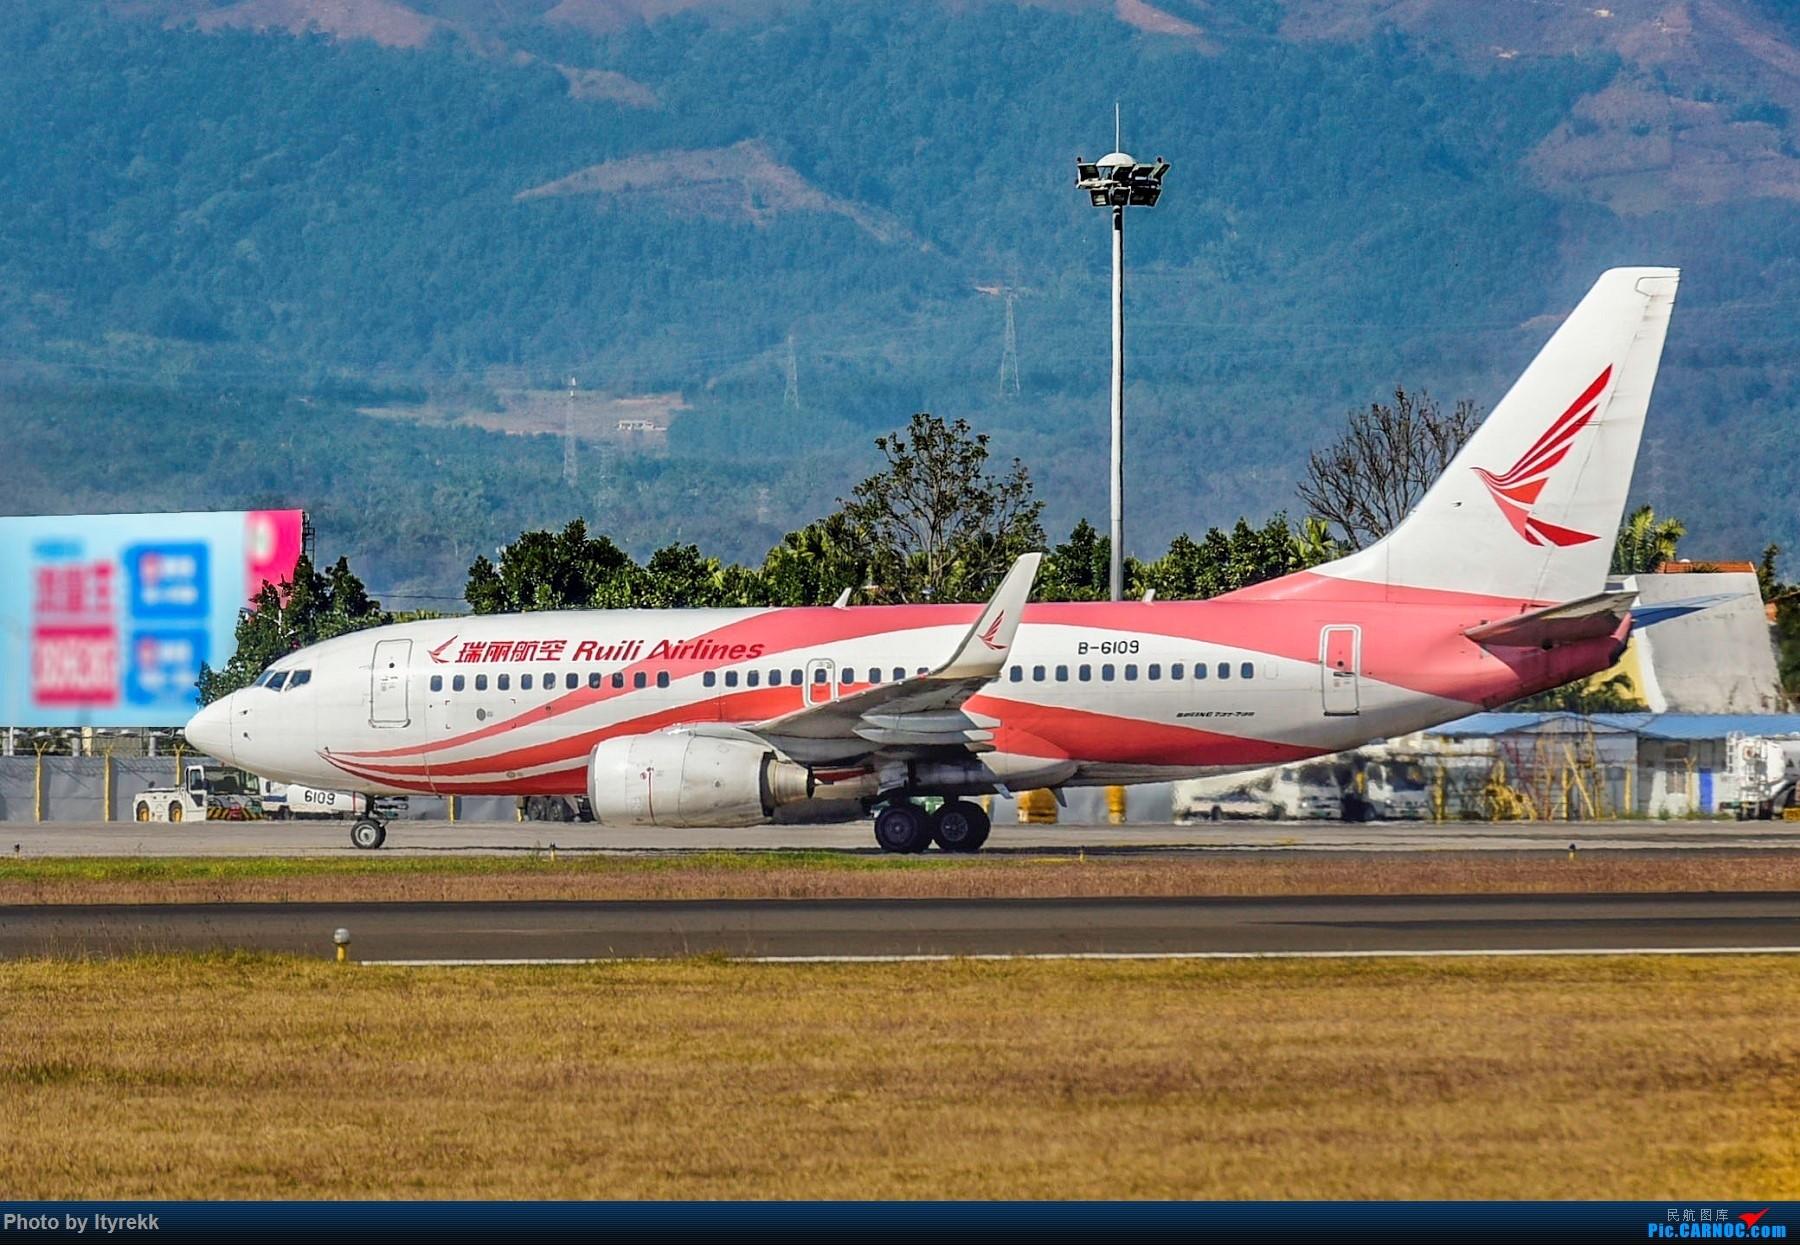 Re:[原创]假期都快完了,不发点图实在惭愧 BOEING 737-700 B-6109 中国芒市机场